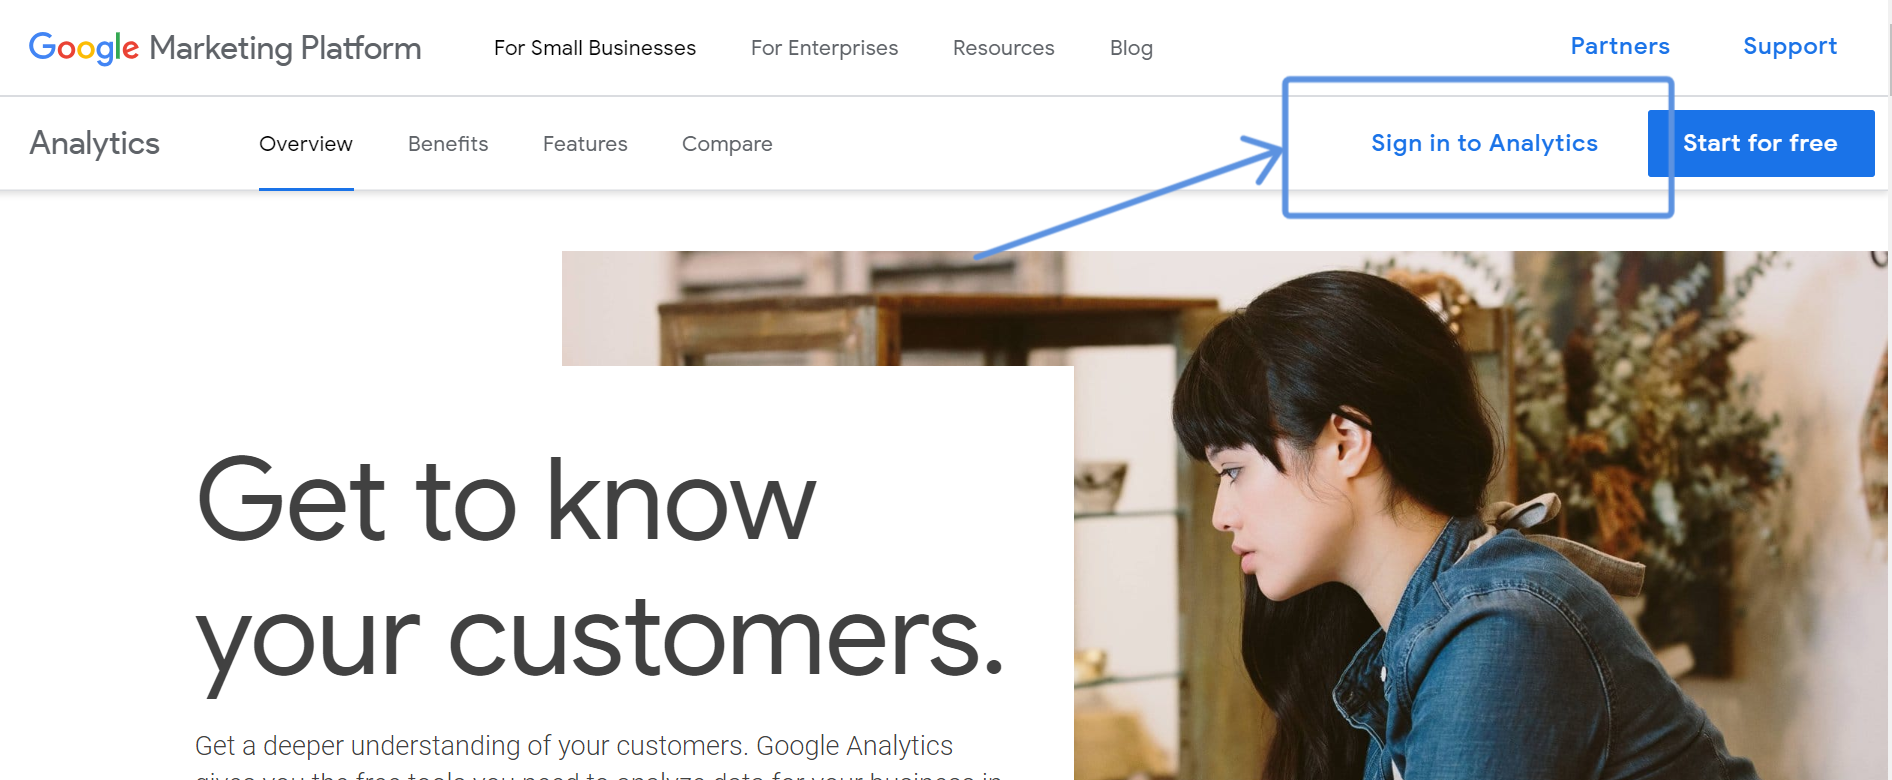 sign into Google Analytics